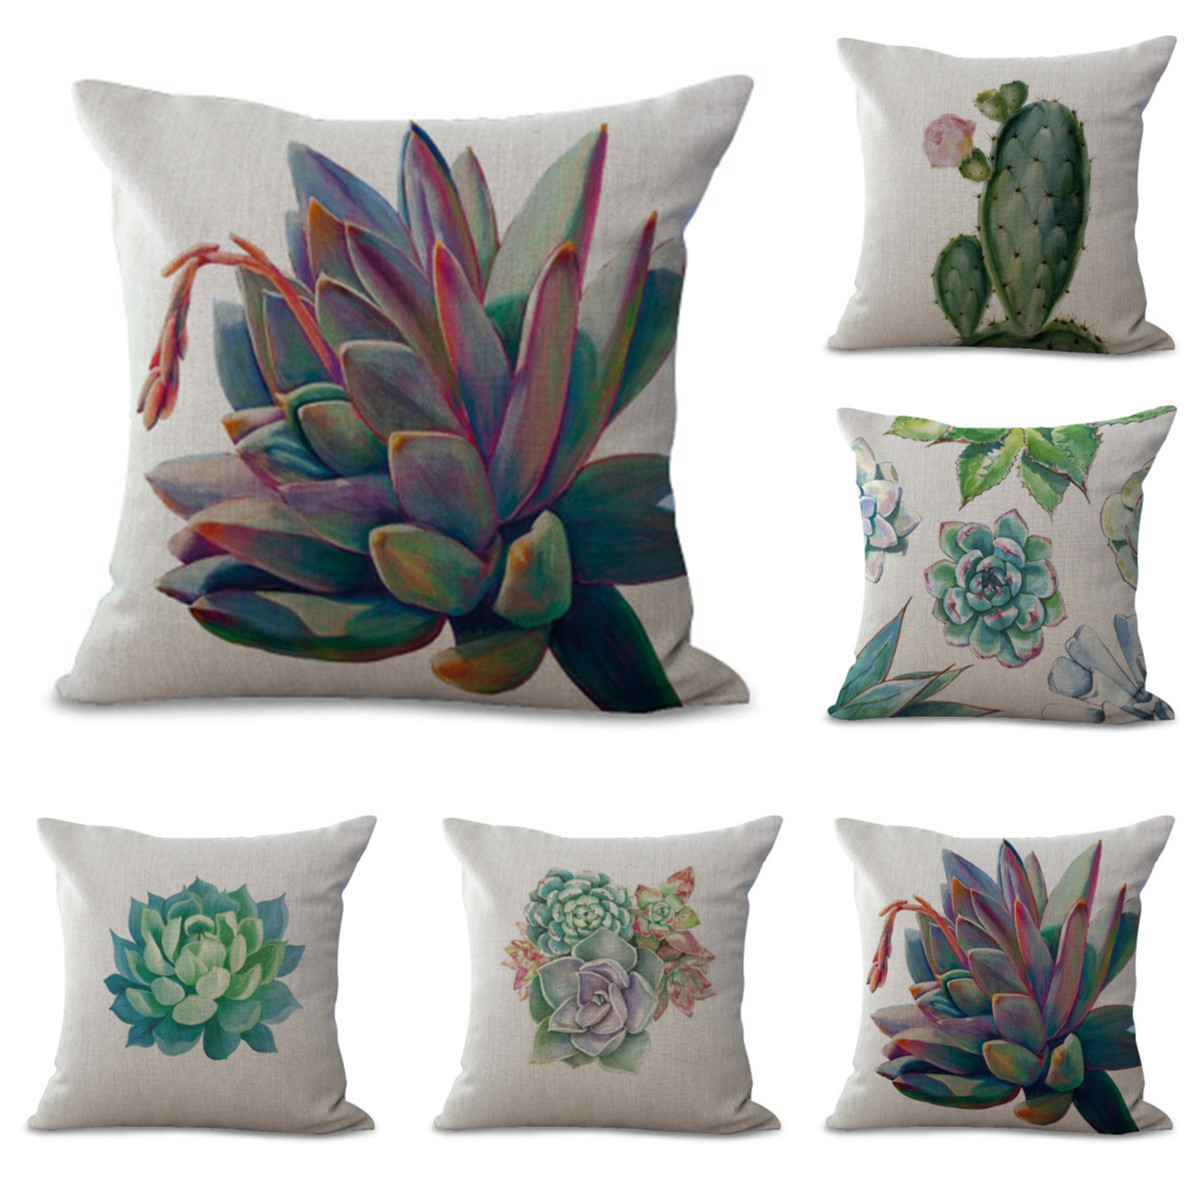 cactus plants green succulent decorative throw pillow case cushion cover 18x18 inch square zipper waist pillowcase pillow protector slip cases sham